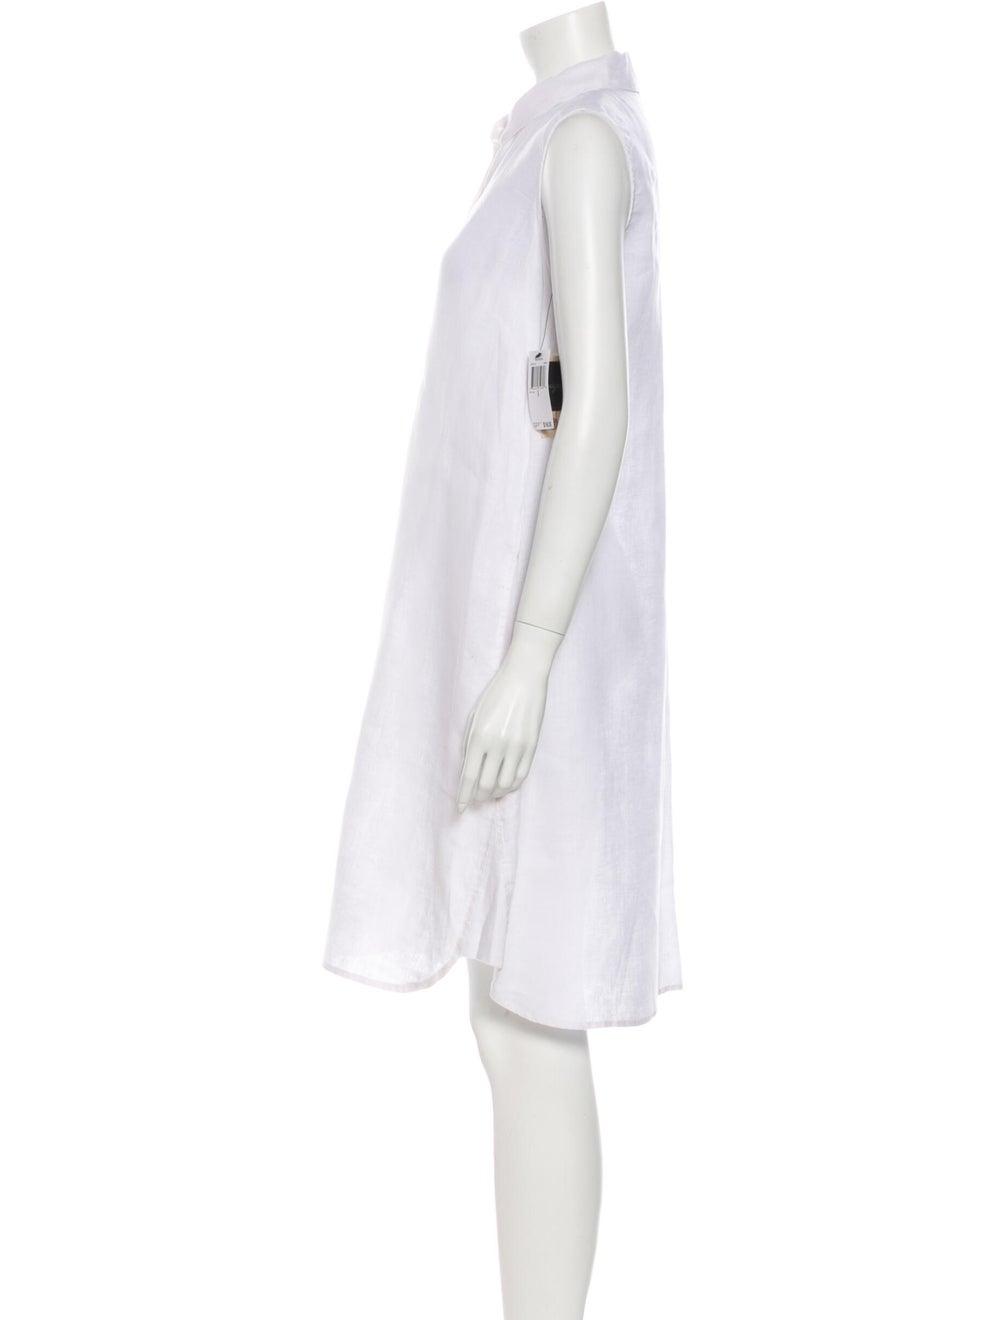 Magaschoni Linen Knee-Length Dress White - image 2